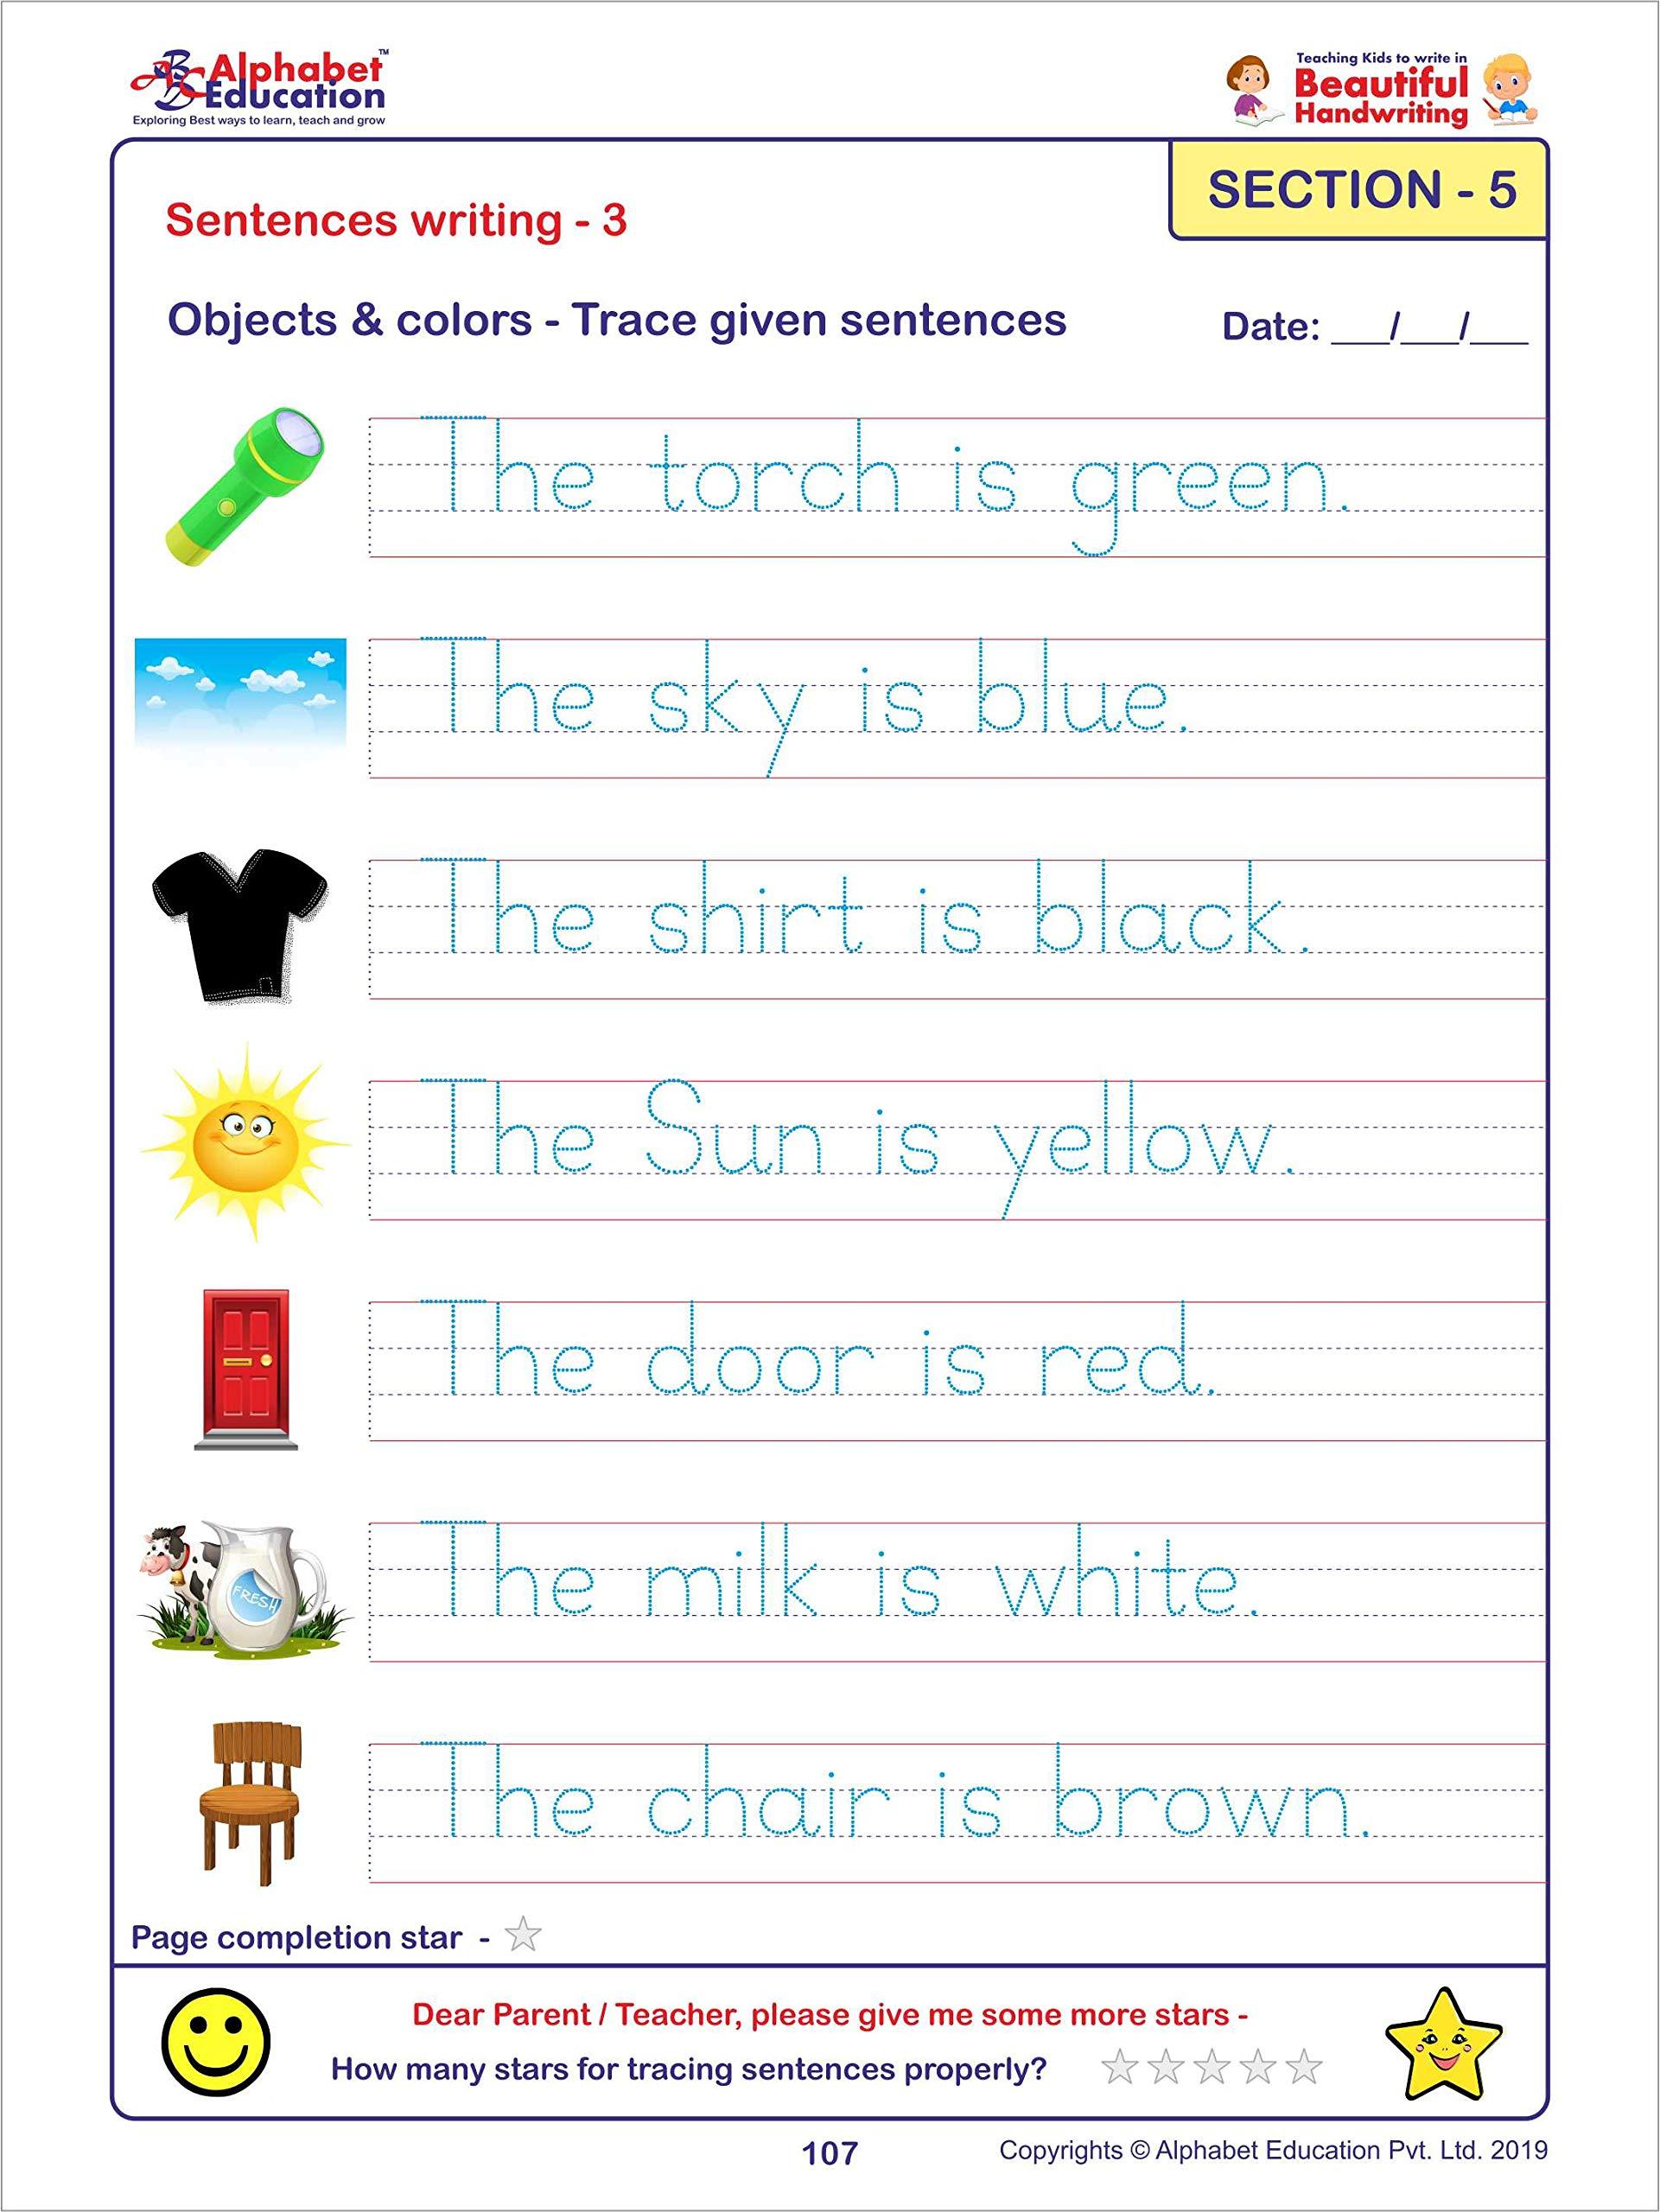 Buy Teaching Kids To Write In Beautiful Handwriting Book